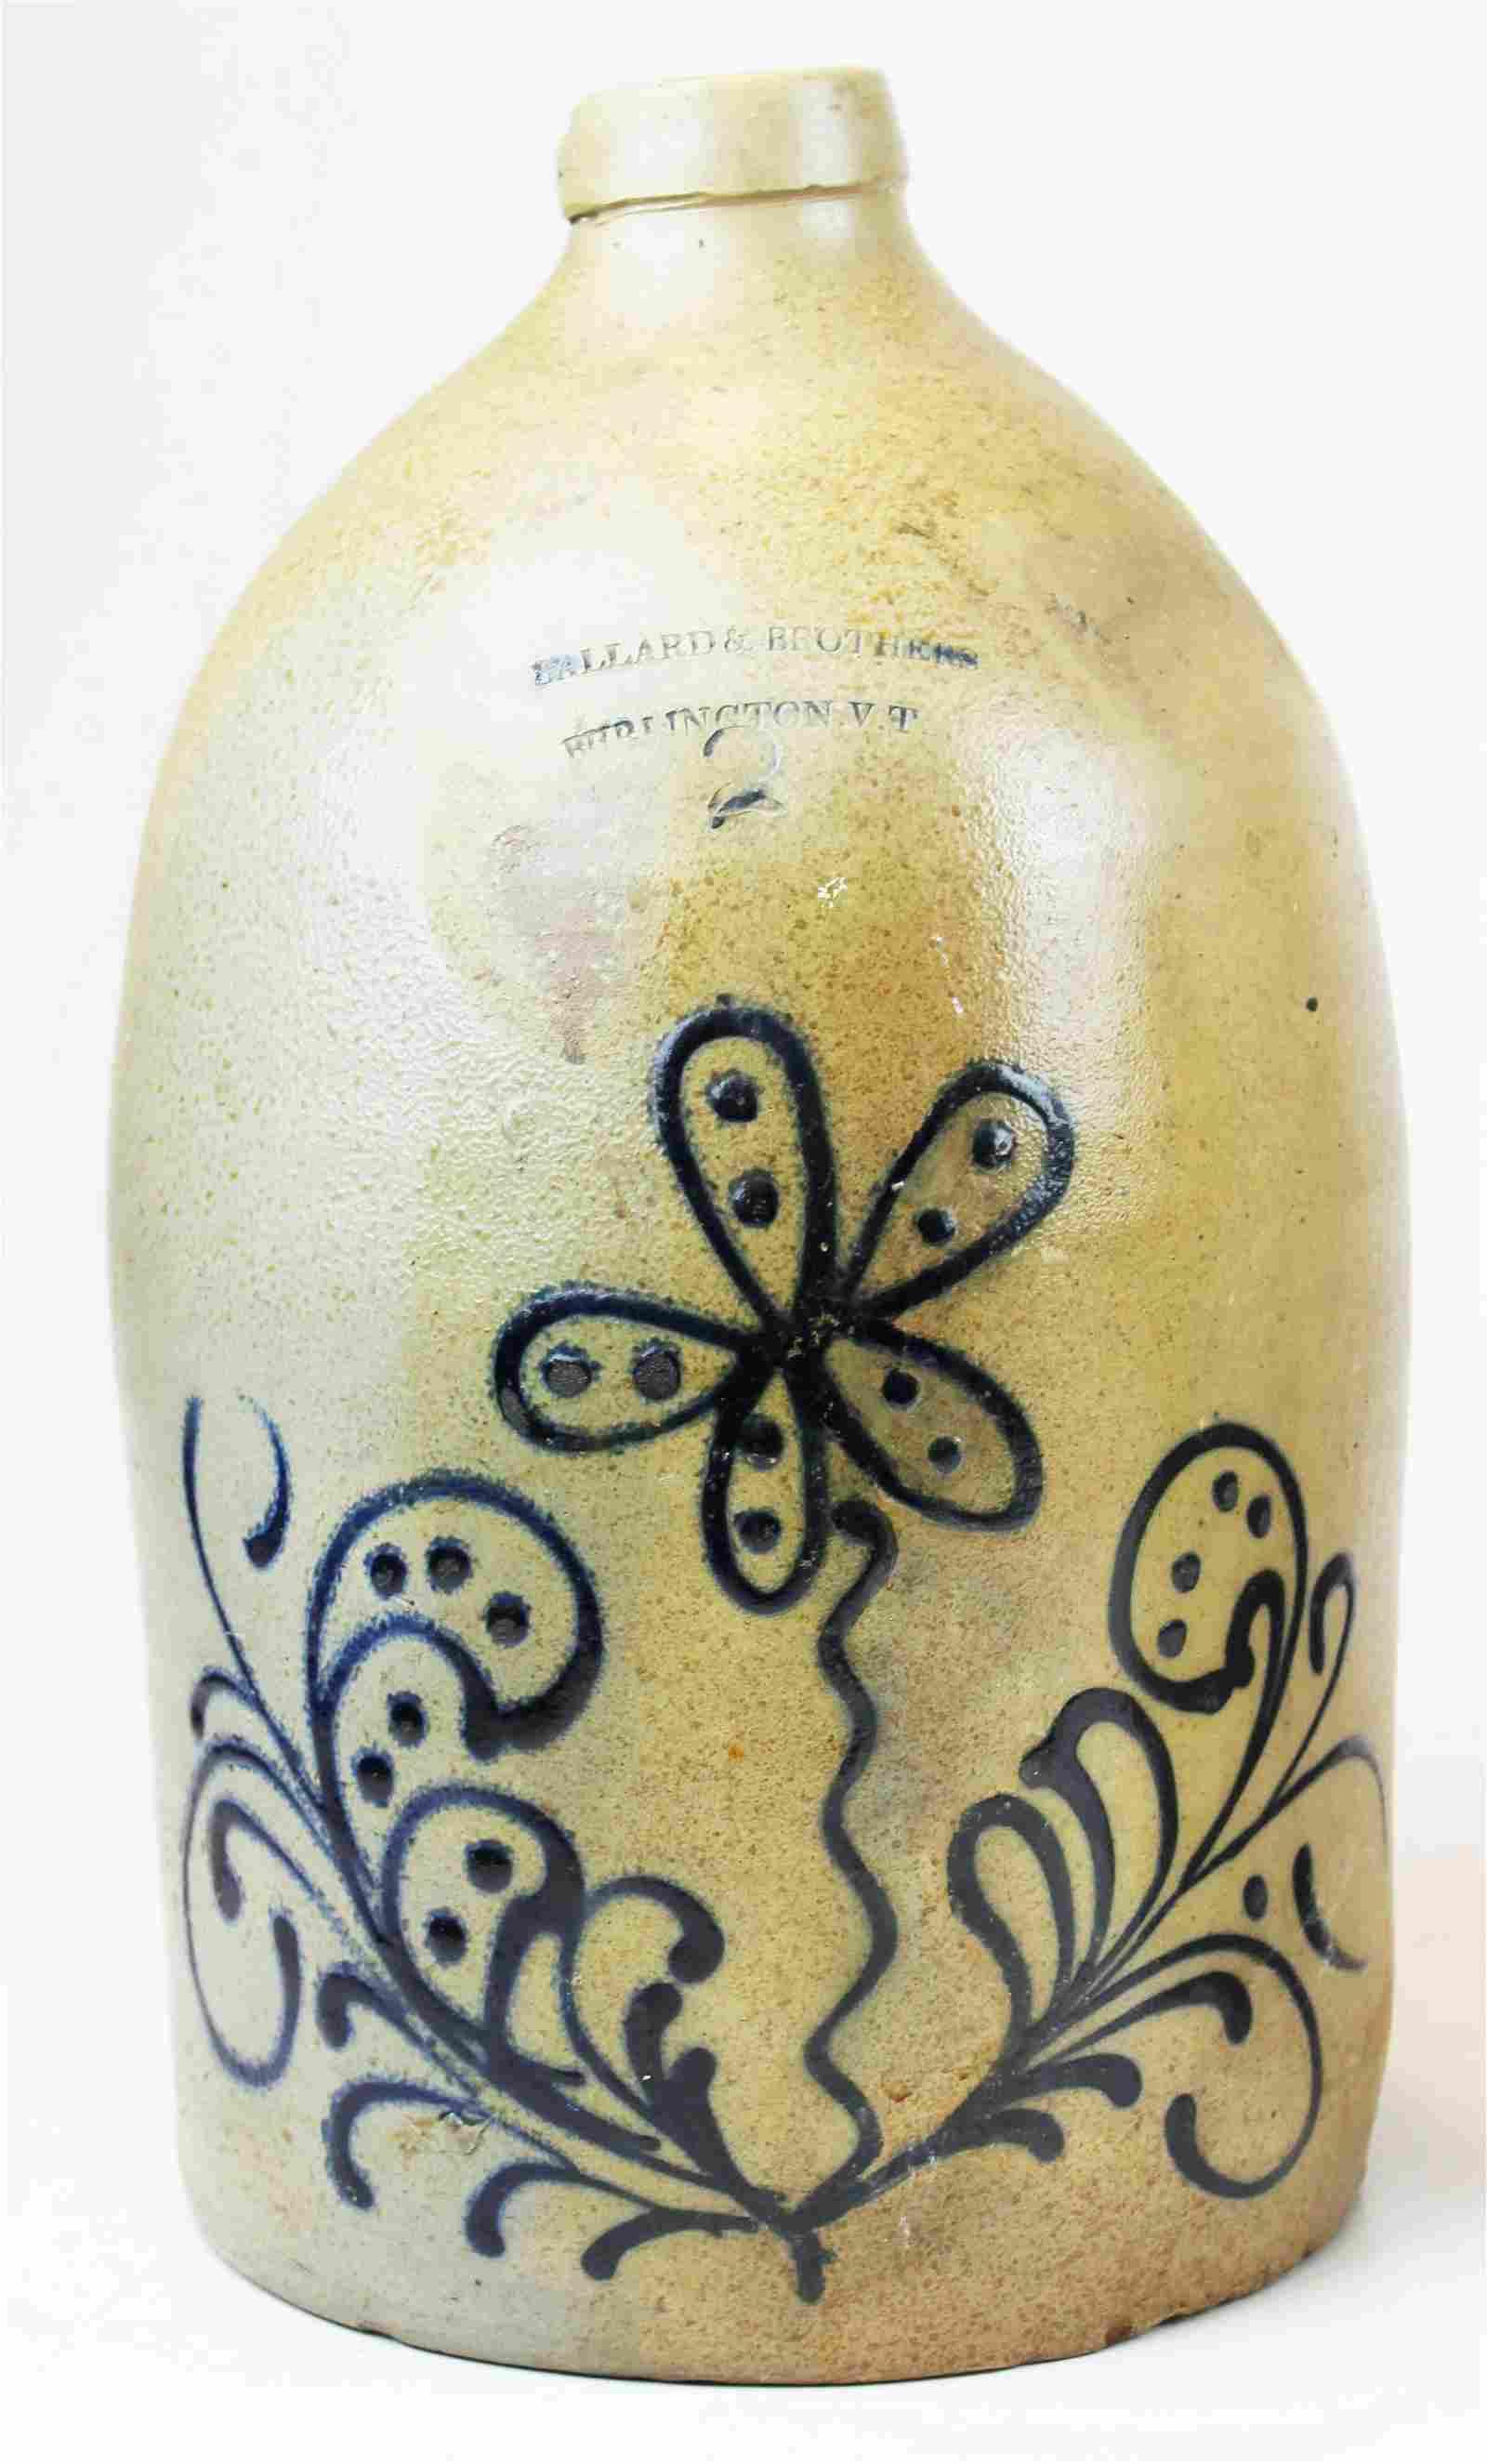 Ballard & Bros blue decorated stoneware jug